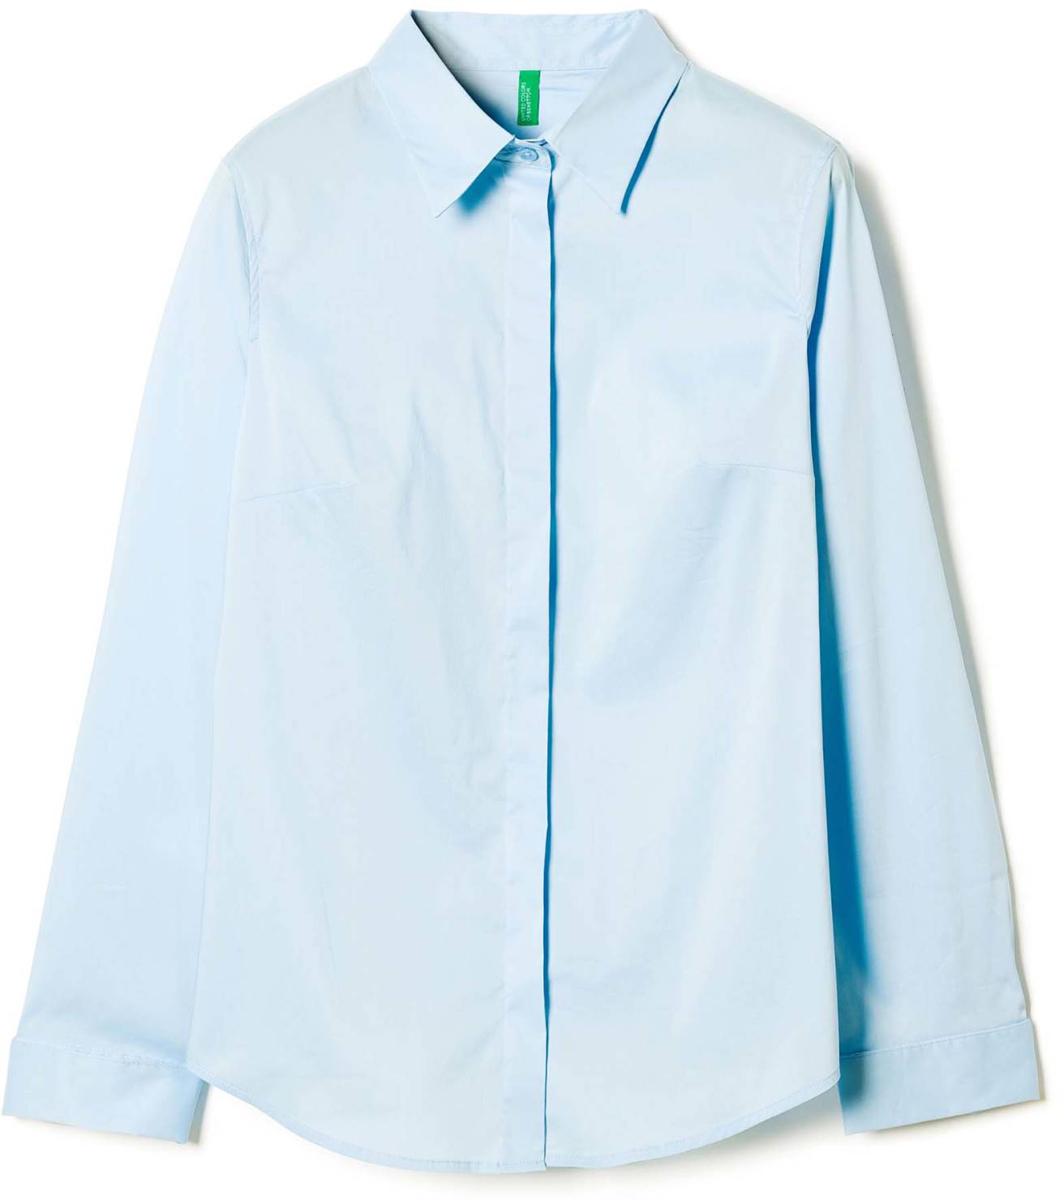 Рубашка жен United Colors of Benetton, цвет: голубой. 5AWR5Q6E3_33G. Размер XS (40/42)5AWR5Q6E3_33G